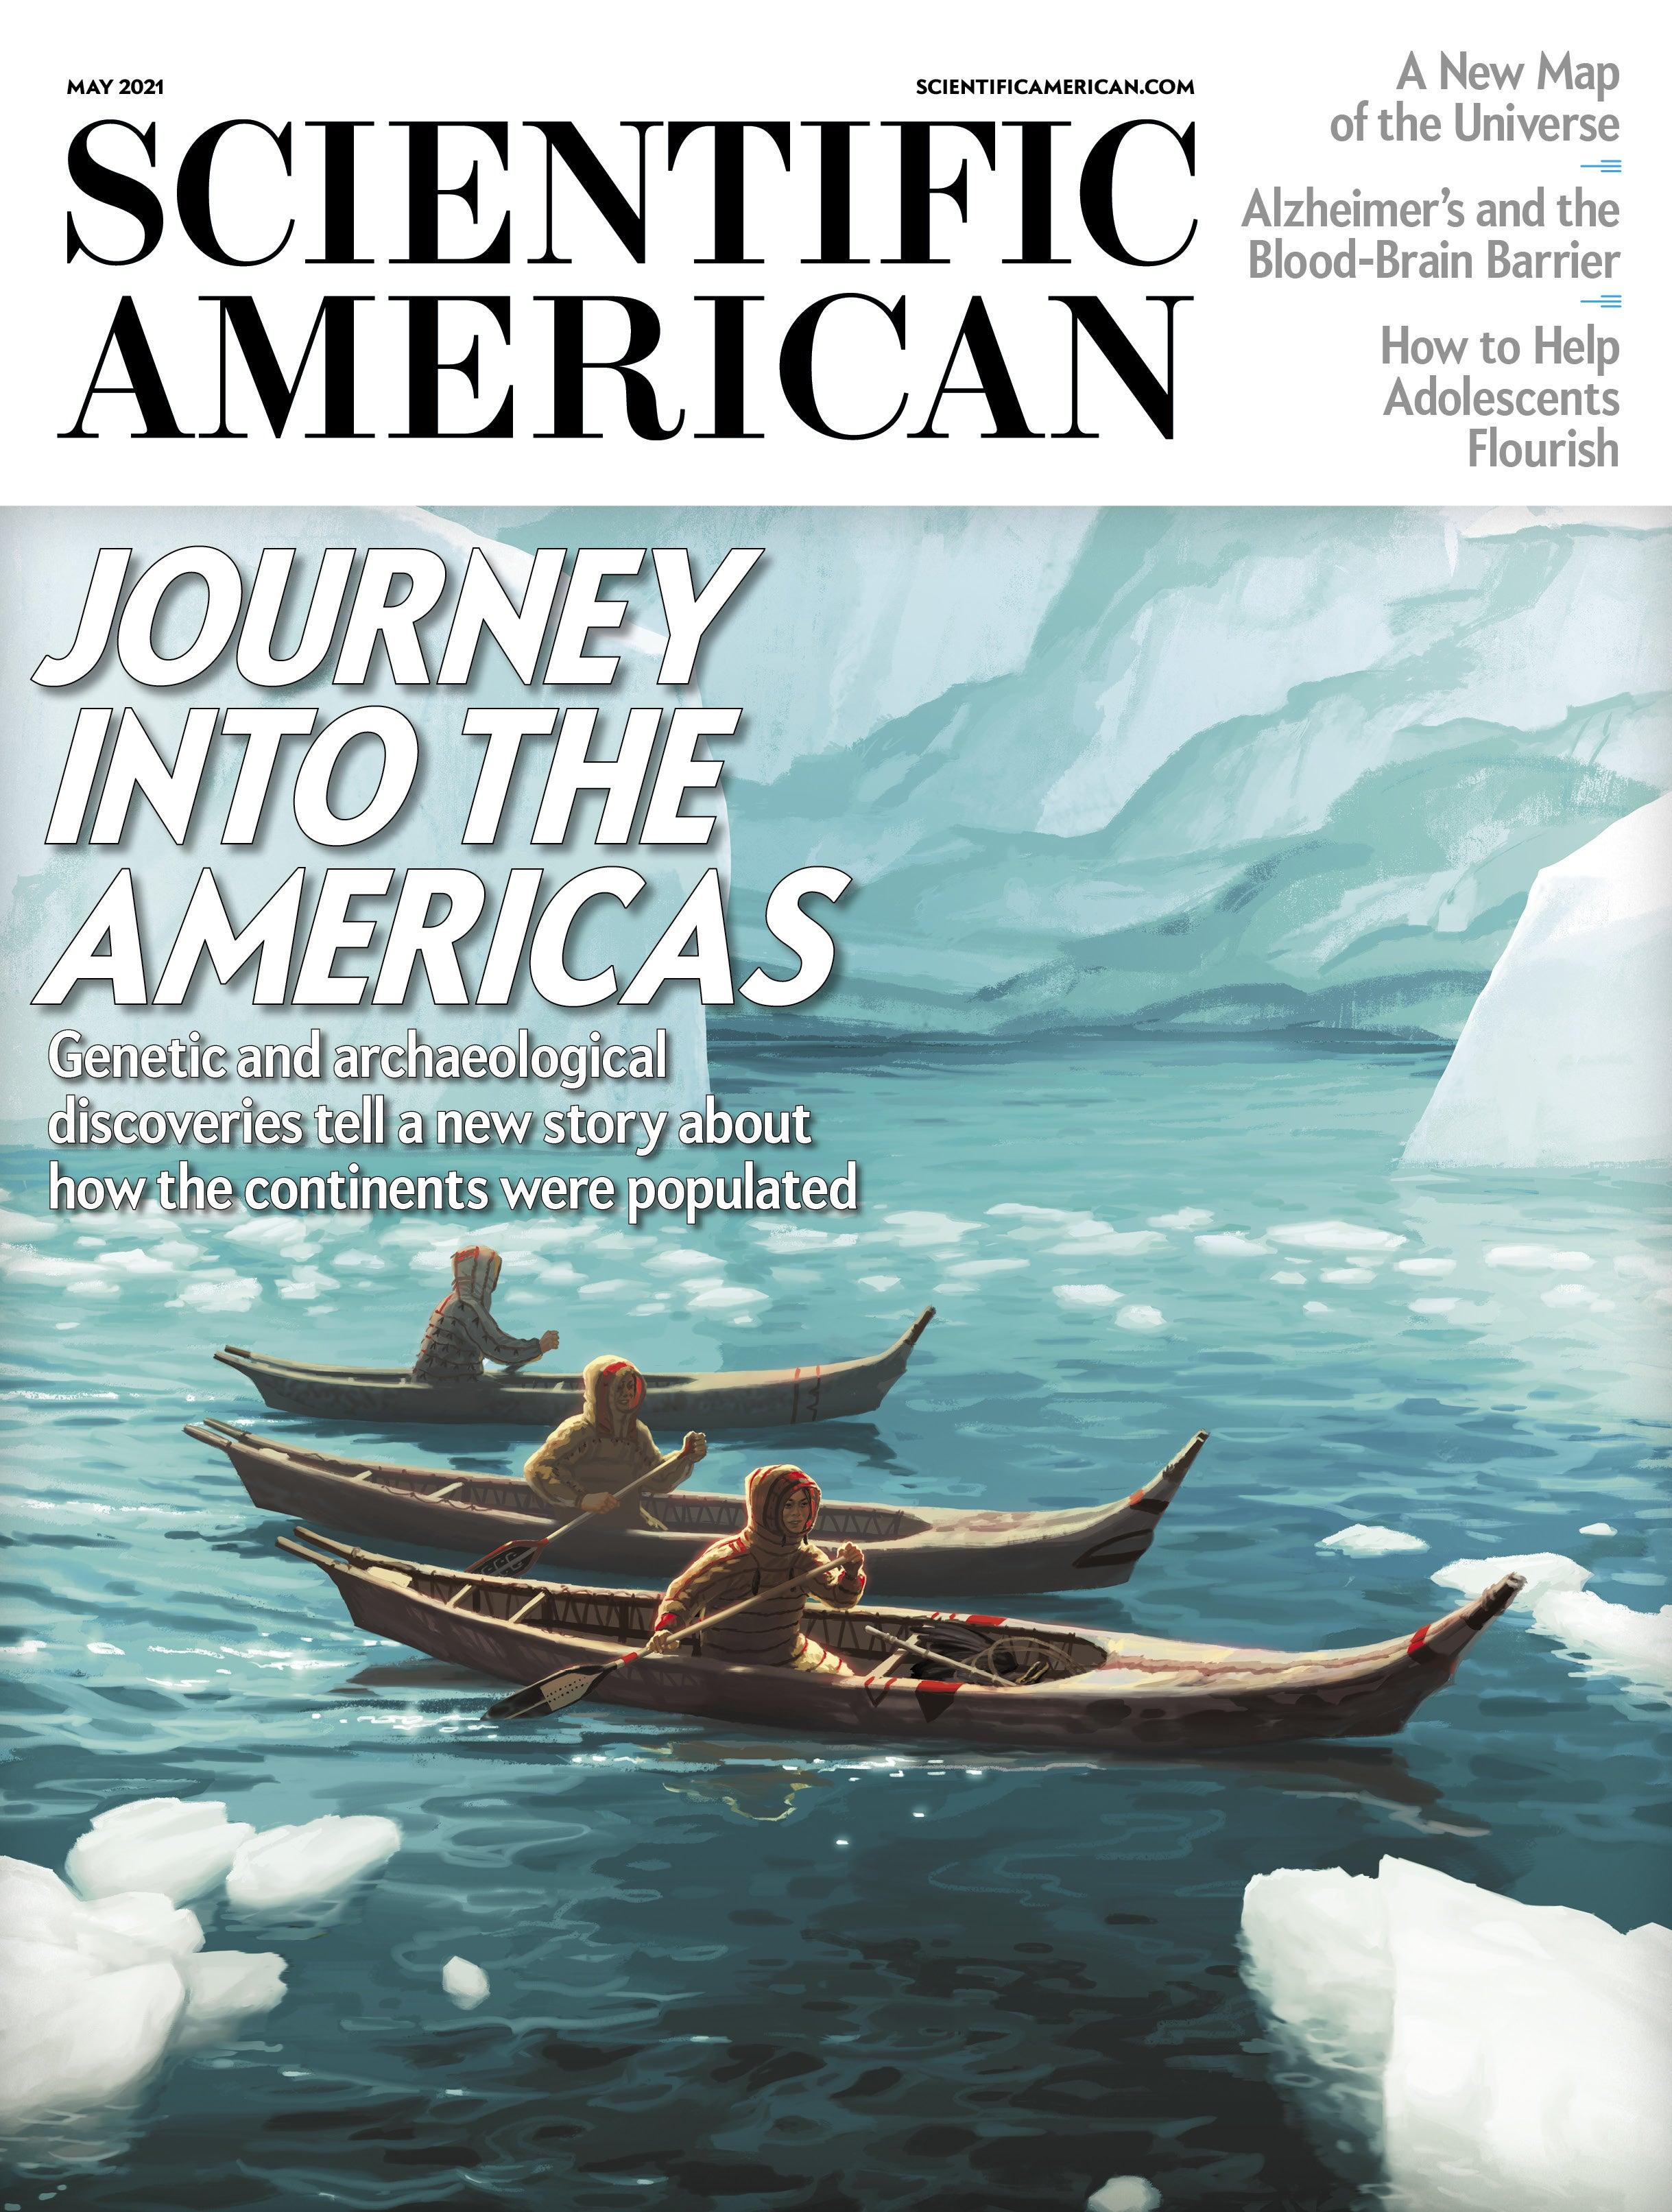 Scientific American: Journey Into the Americas